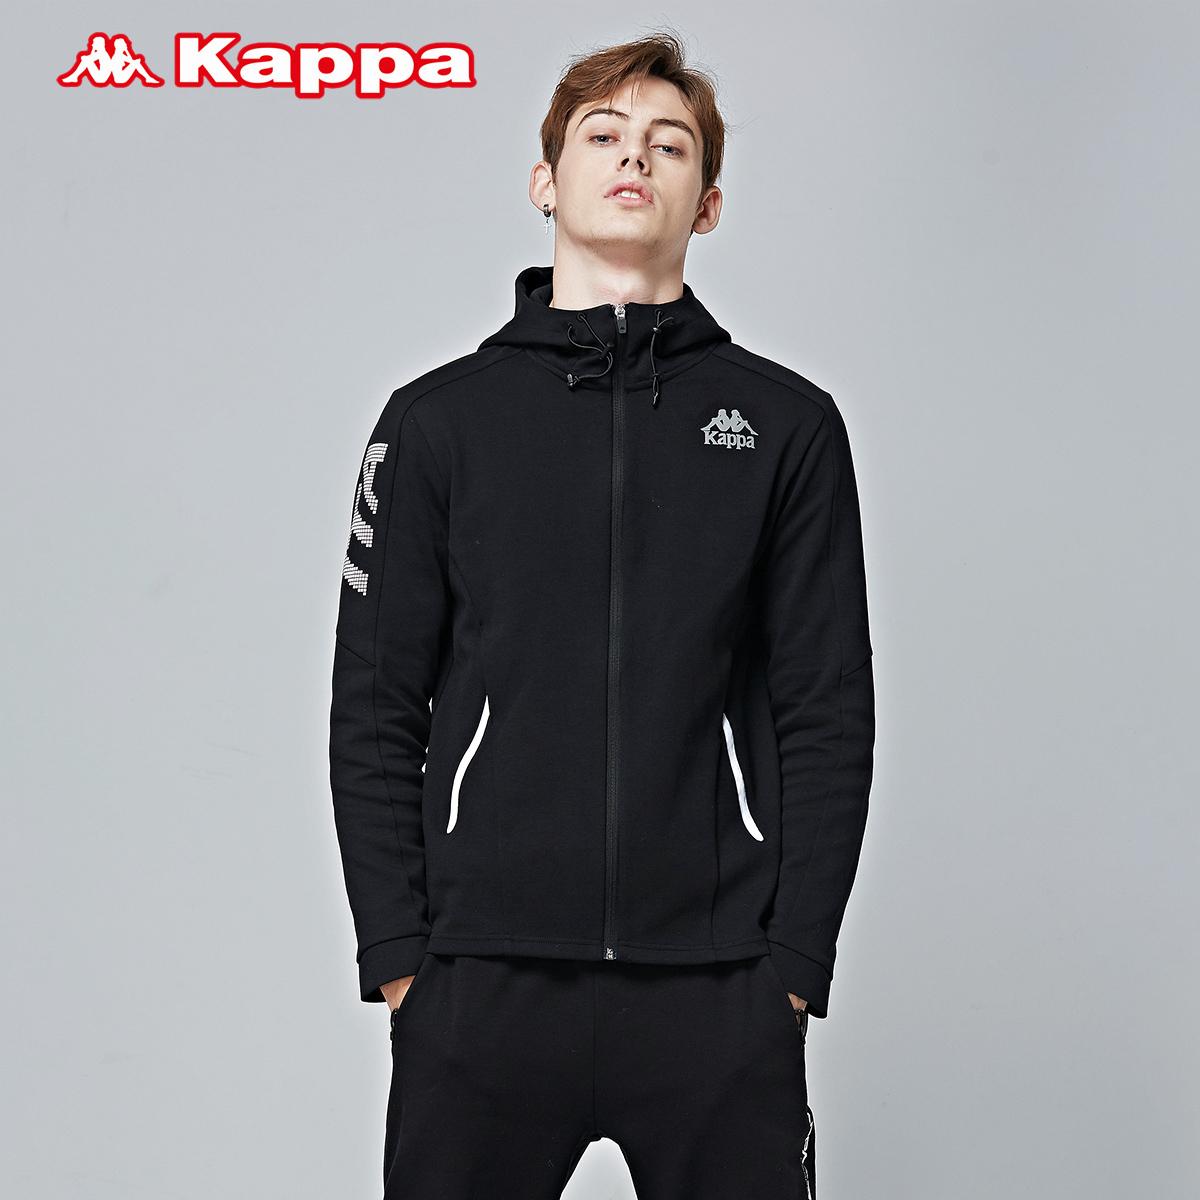 Kappa卡帕男款运动卫衣 针织帽衫外套运动上衣2018新品|K0812MK05